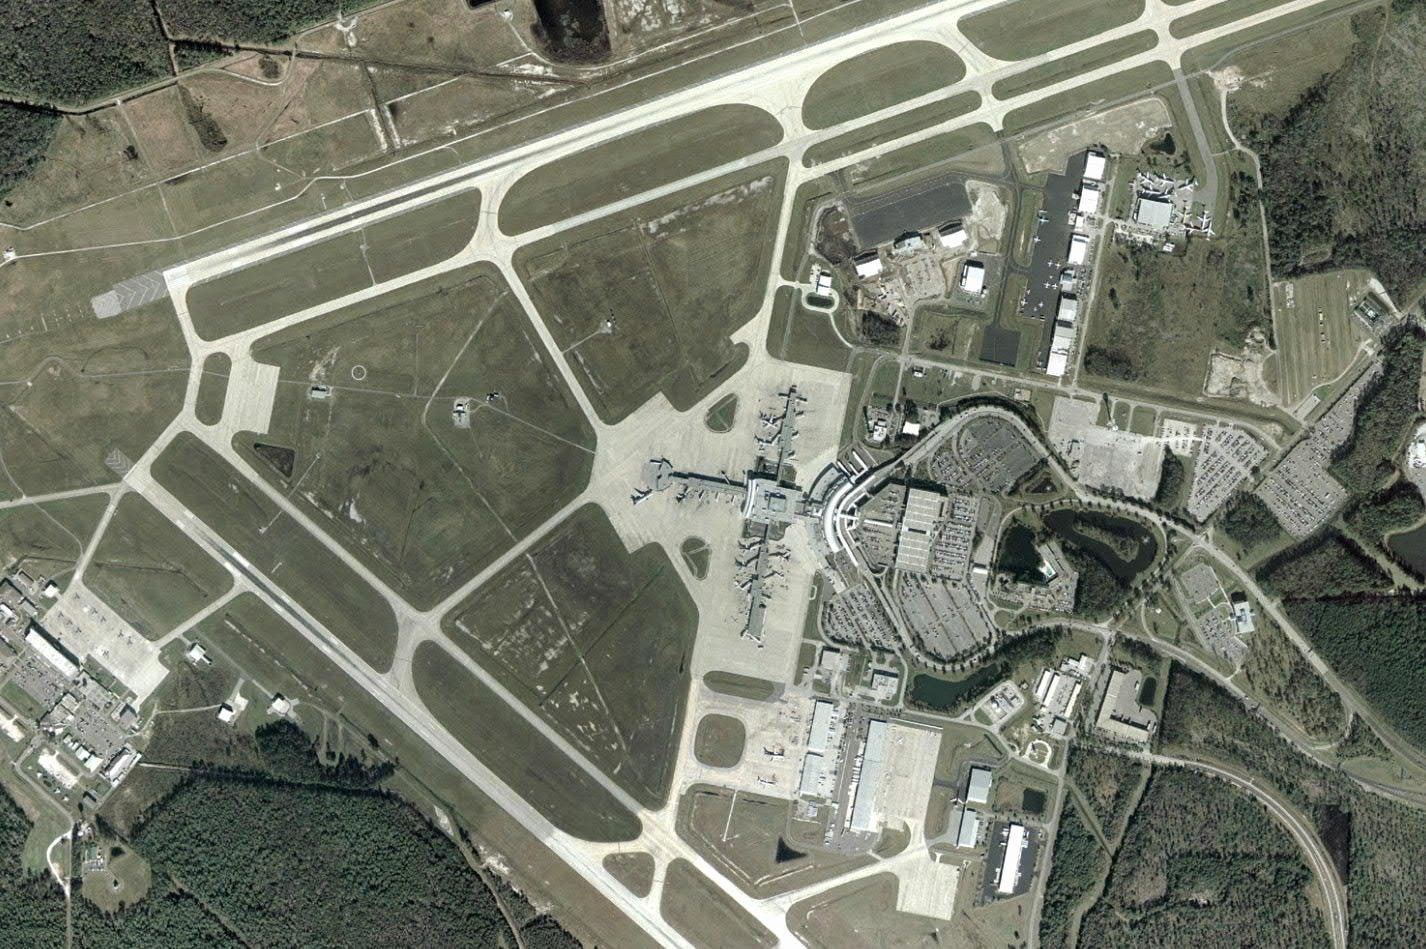 Stormwater Pollution Prevention Plan Template Best Of Jetblue Airways